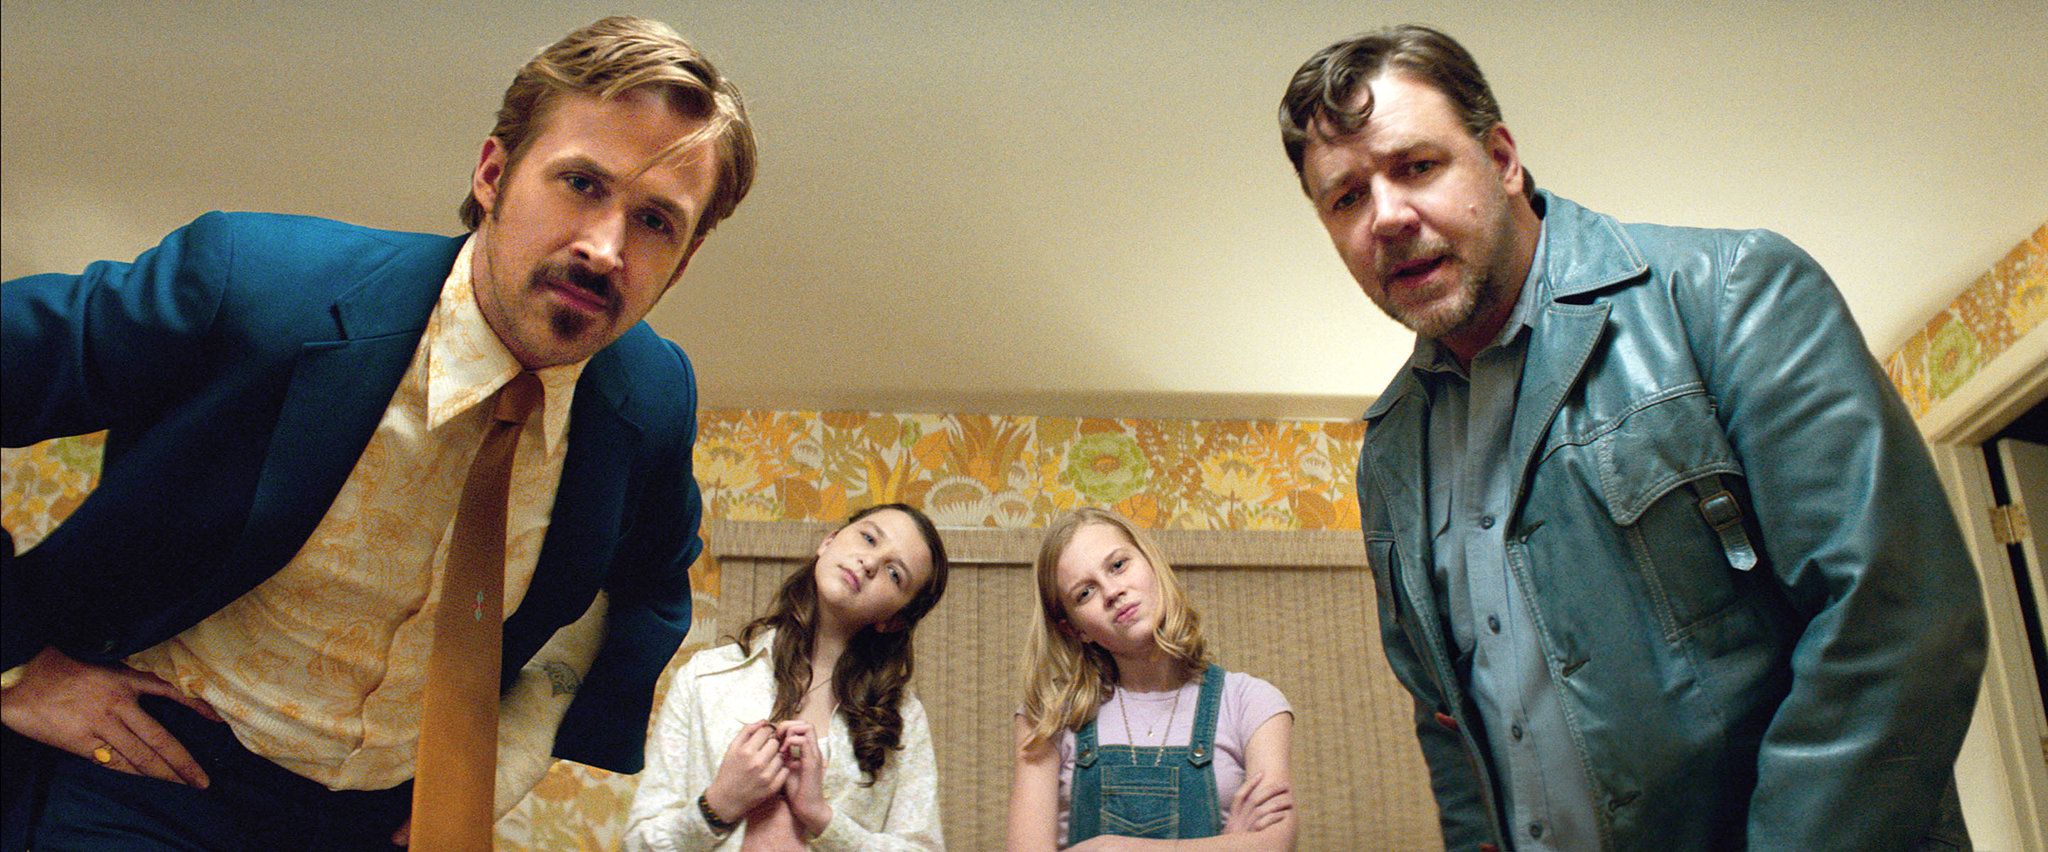 Best Movies to Watch in Quarantine